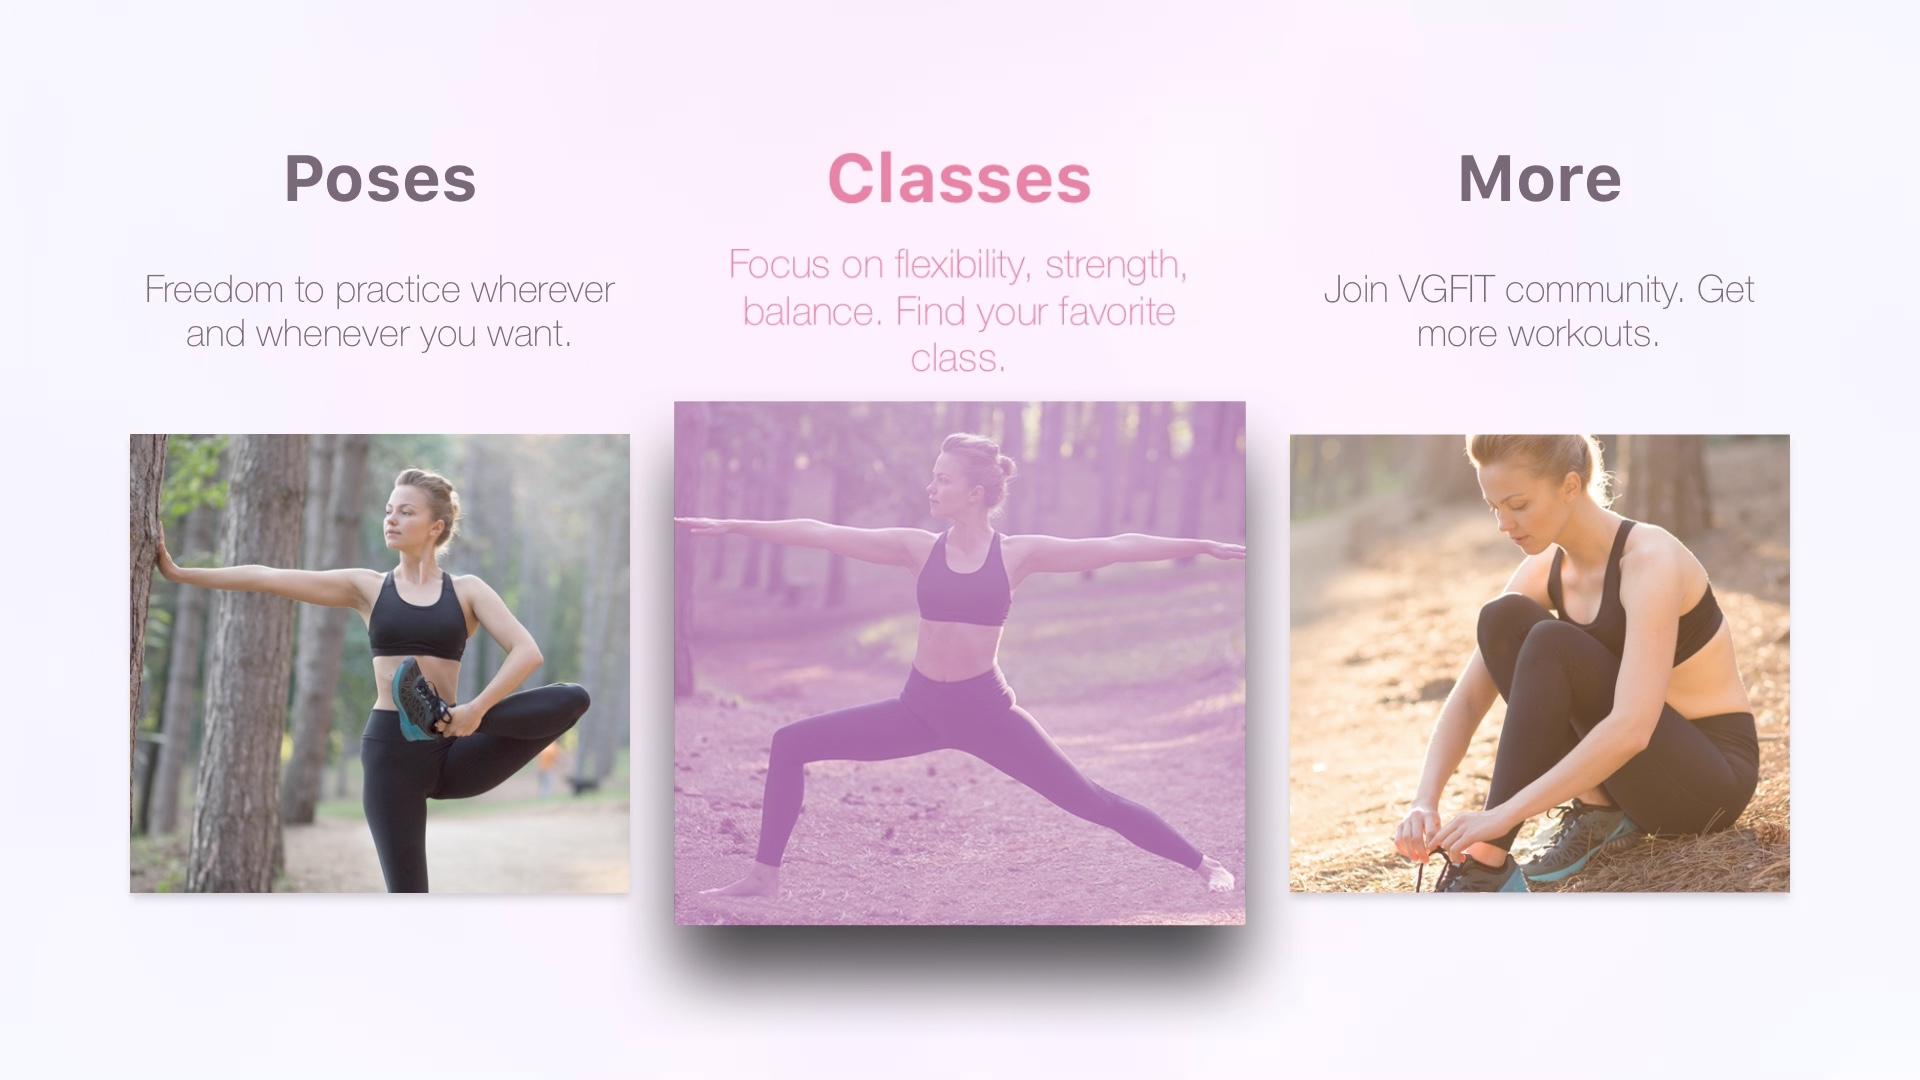 Yoga Poses For Beginners App